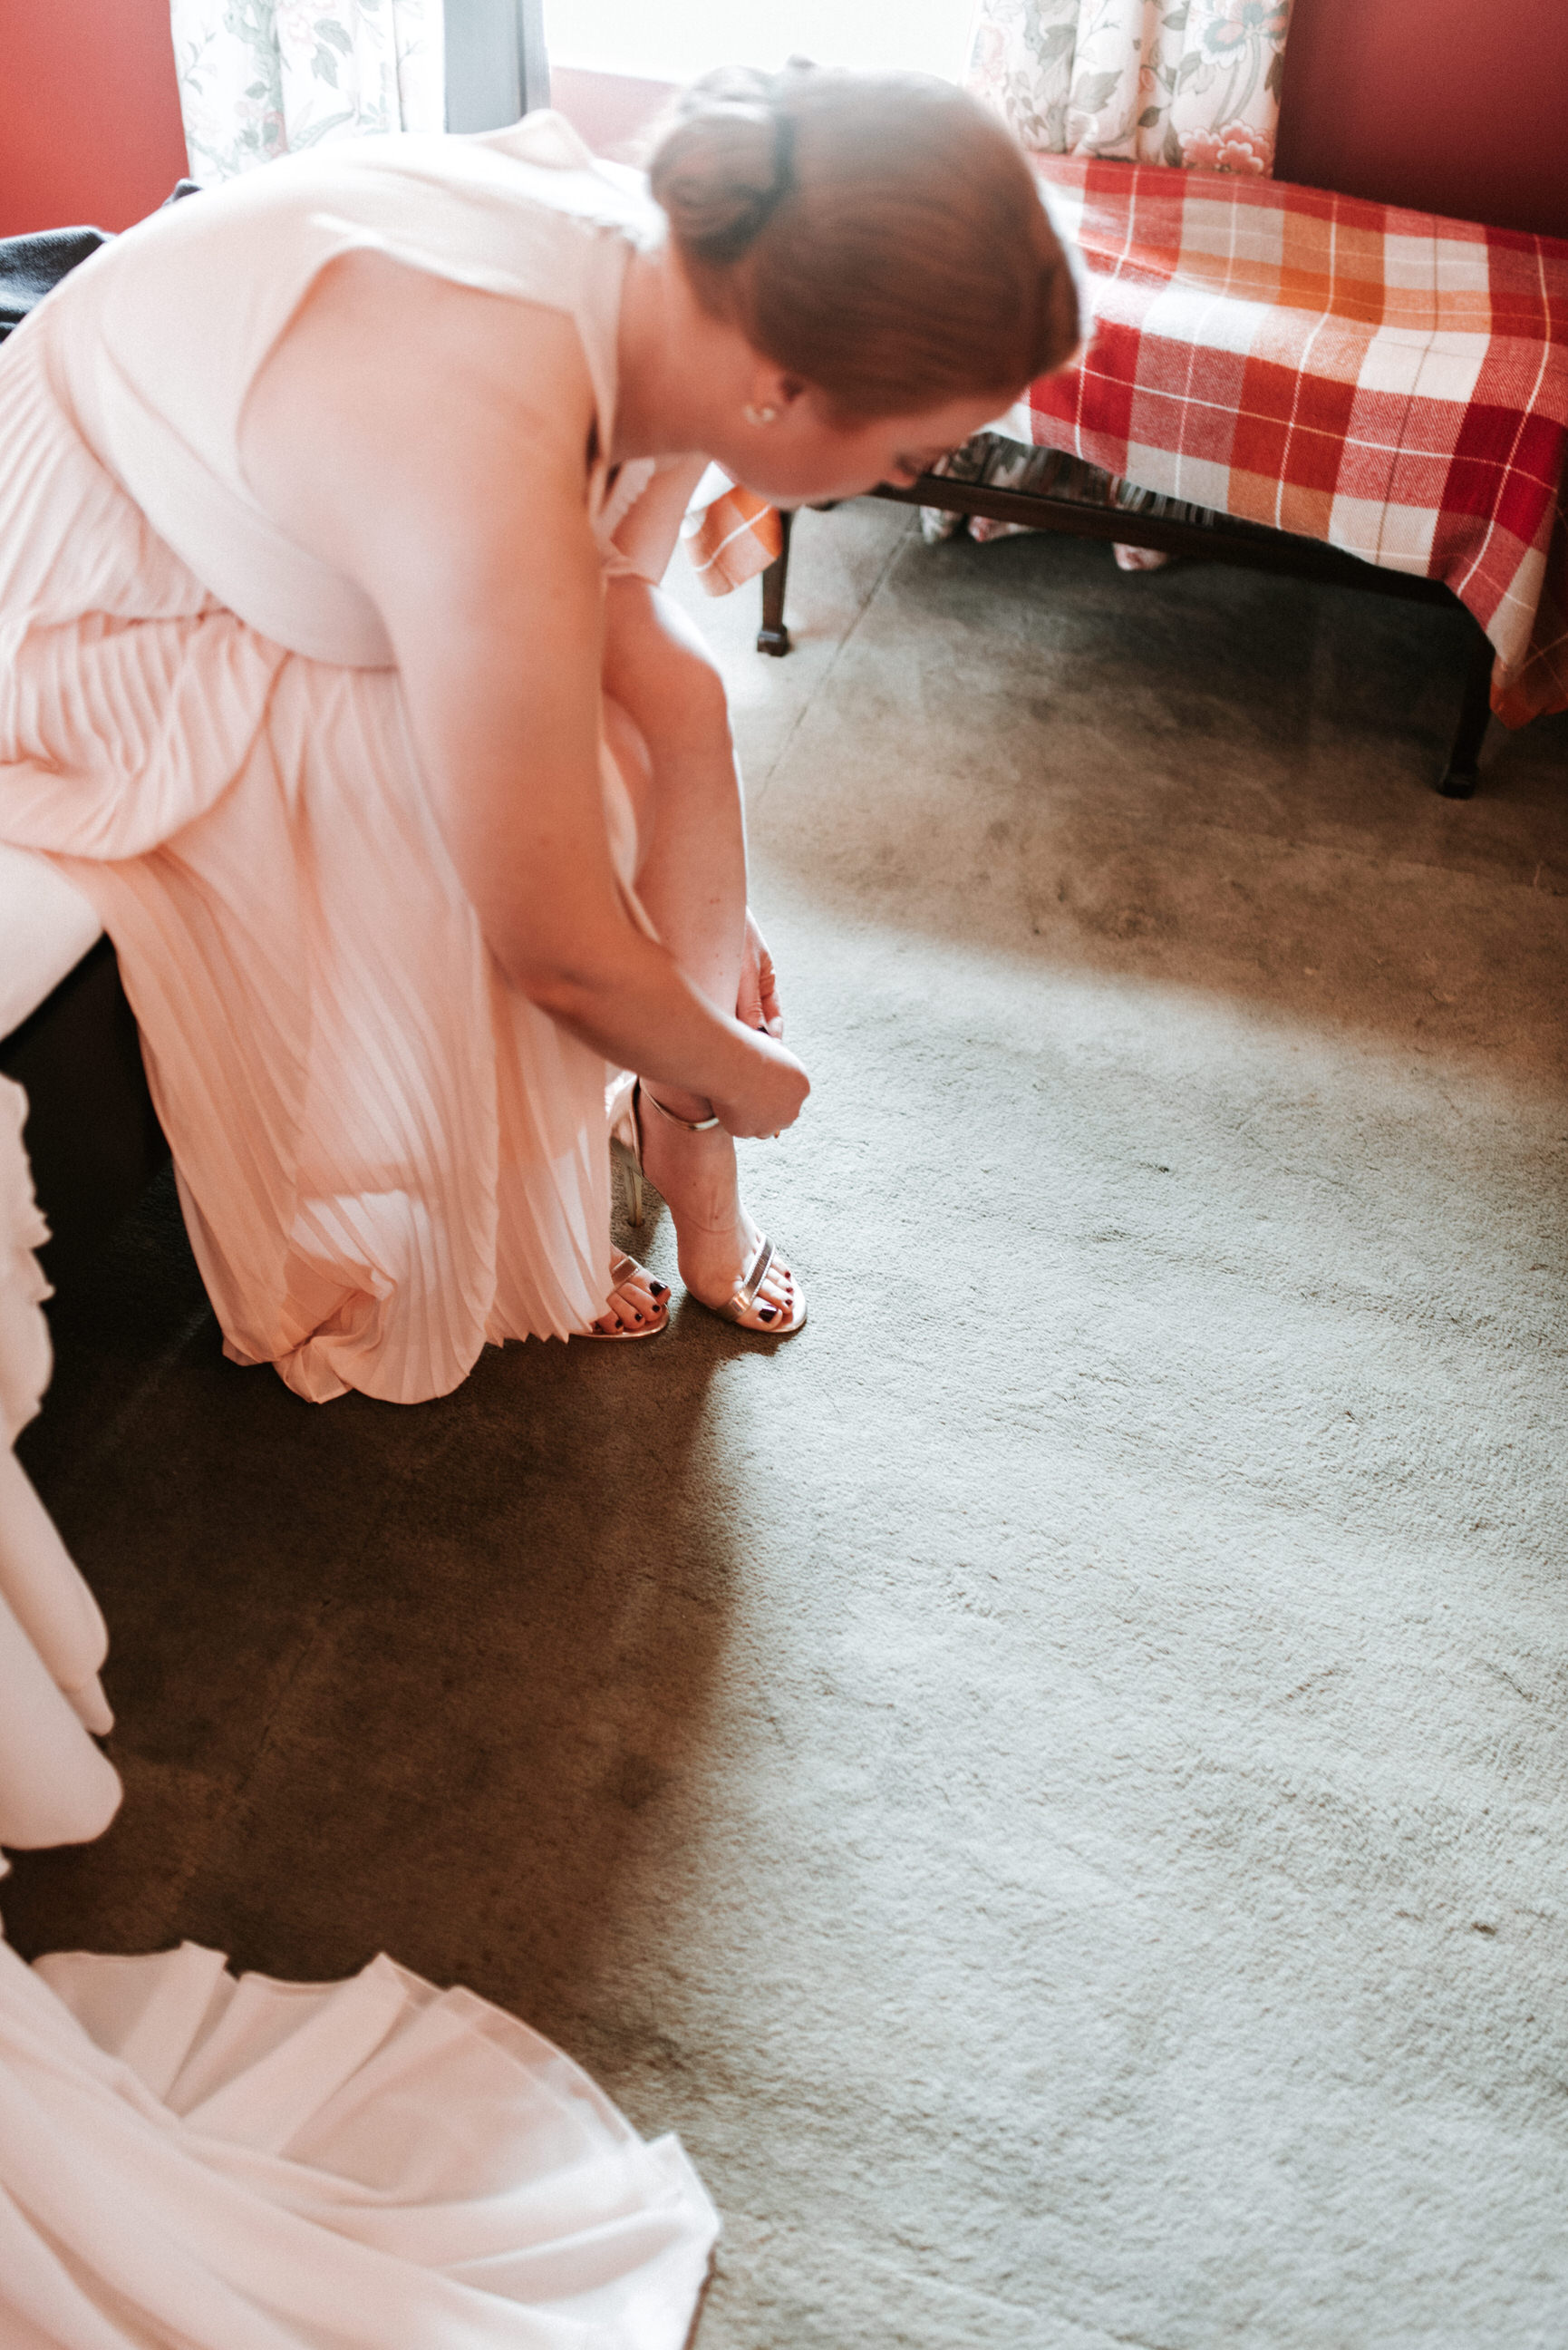 lissanoure castle wedding, northern ireland wedding photographer, romantic northern irish wedding venue, castle wedding ireland, natural wedding photography ni (28).jpg